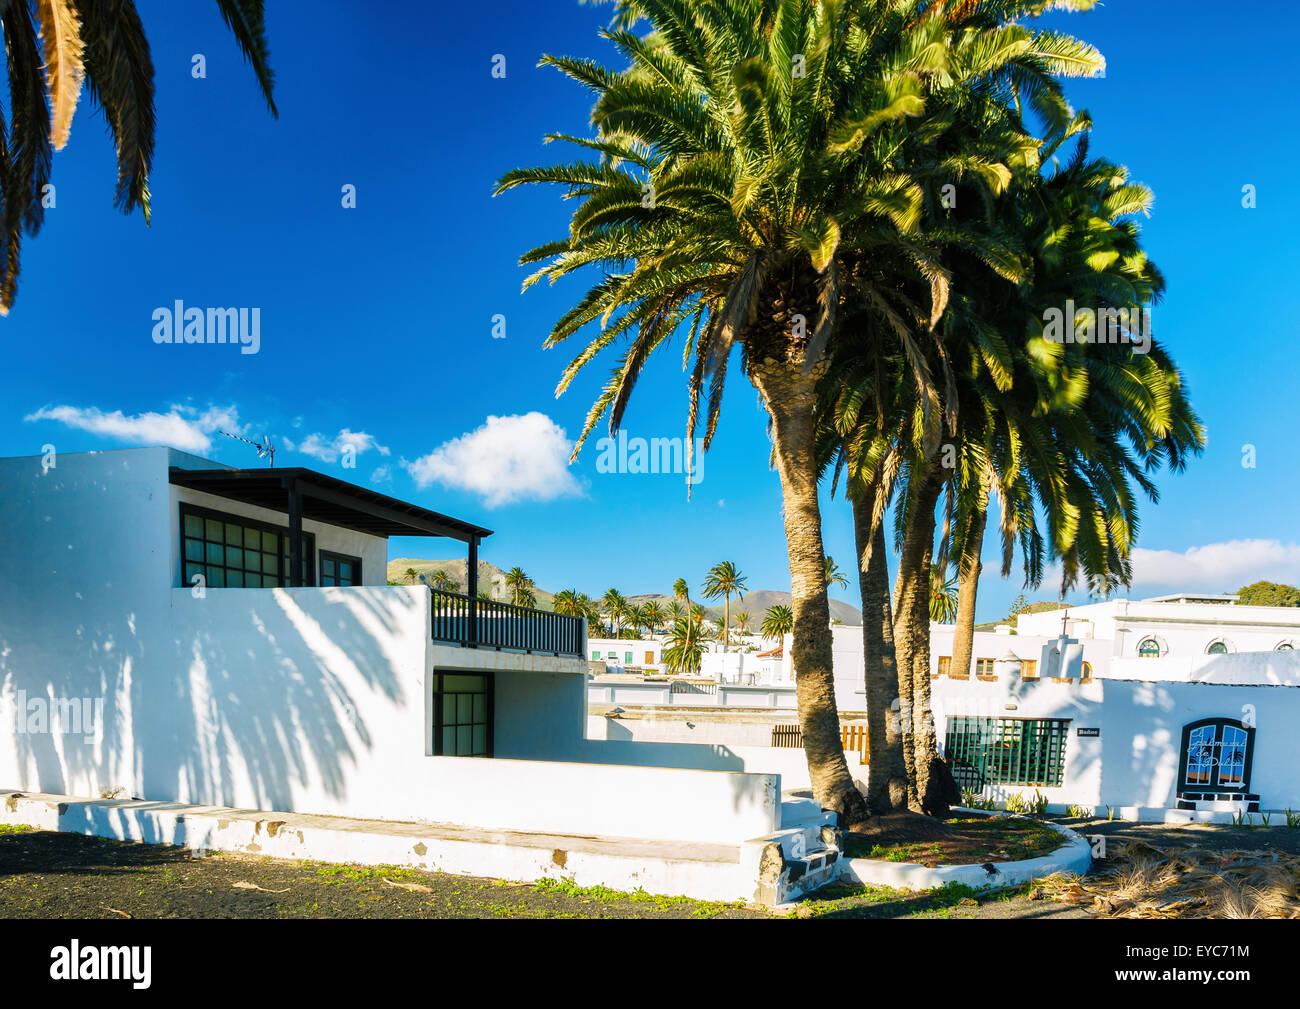 Haria Dorf. Lanzarote, Kanarische Inseln, Spanien, Europa. Stockfoto